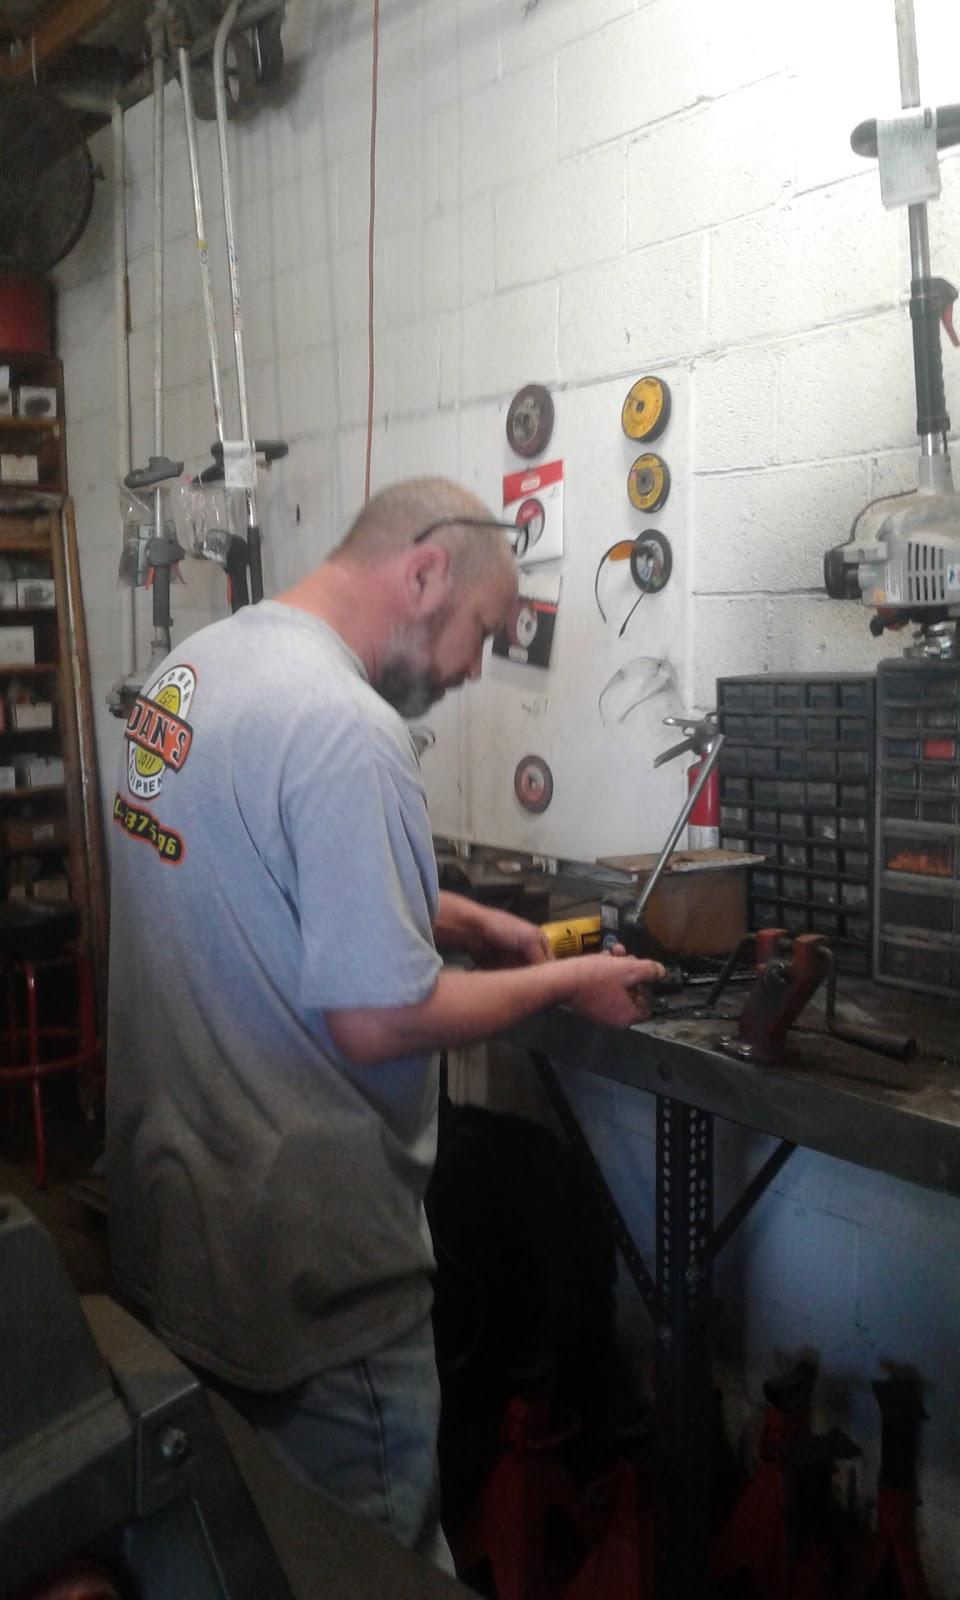 Dans Power Equipment LLC - store  | Photo 1 of 1 | Address: 11000 SE 59th St, Oklahoma City, OK 73150, USA | Phone: (405) 737-5296